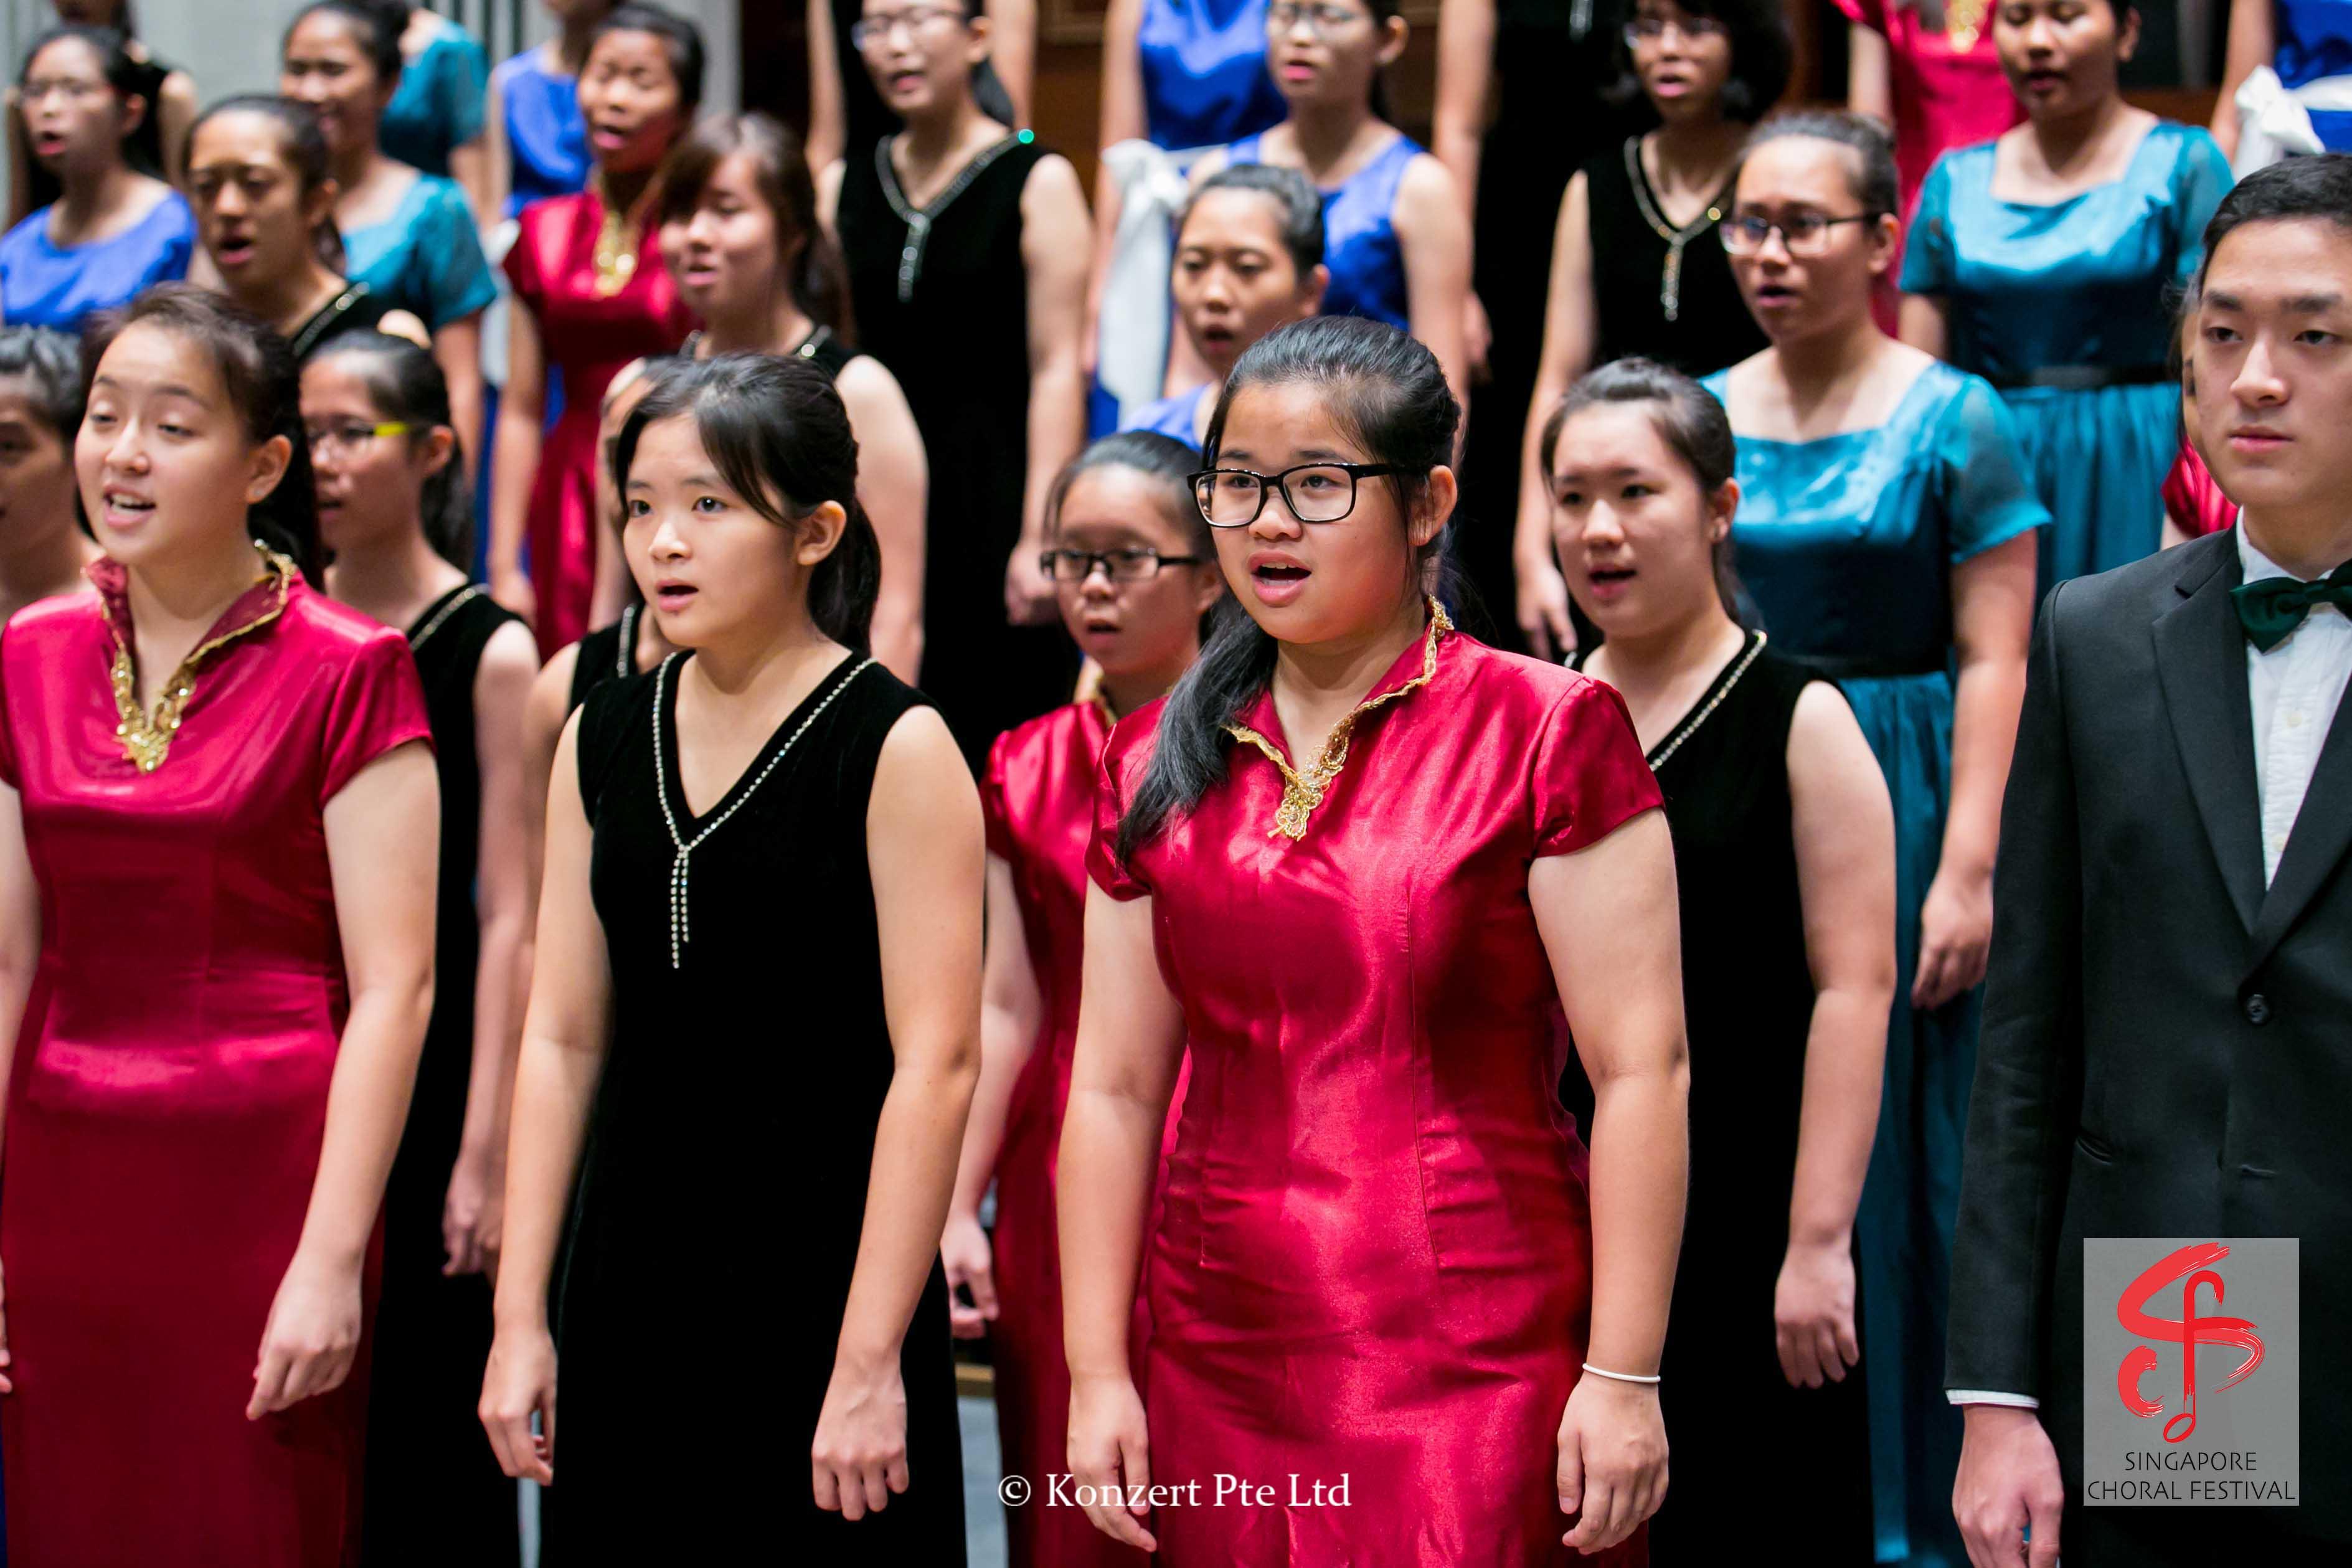 Singapore Choral Festival 7-8-15 (131).jpg